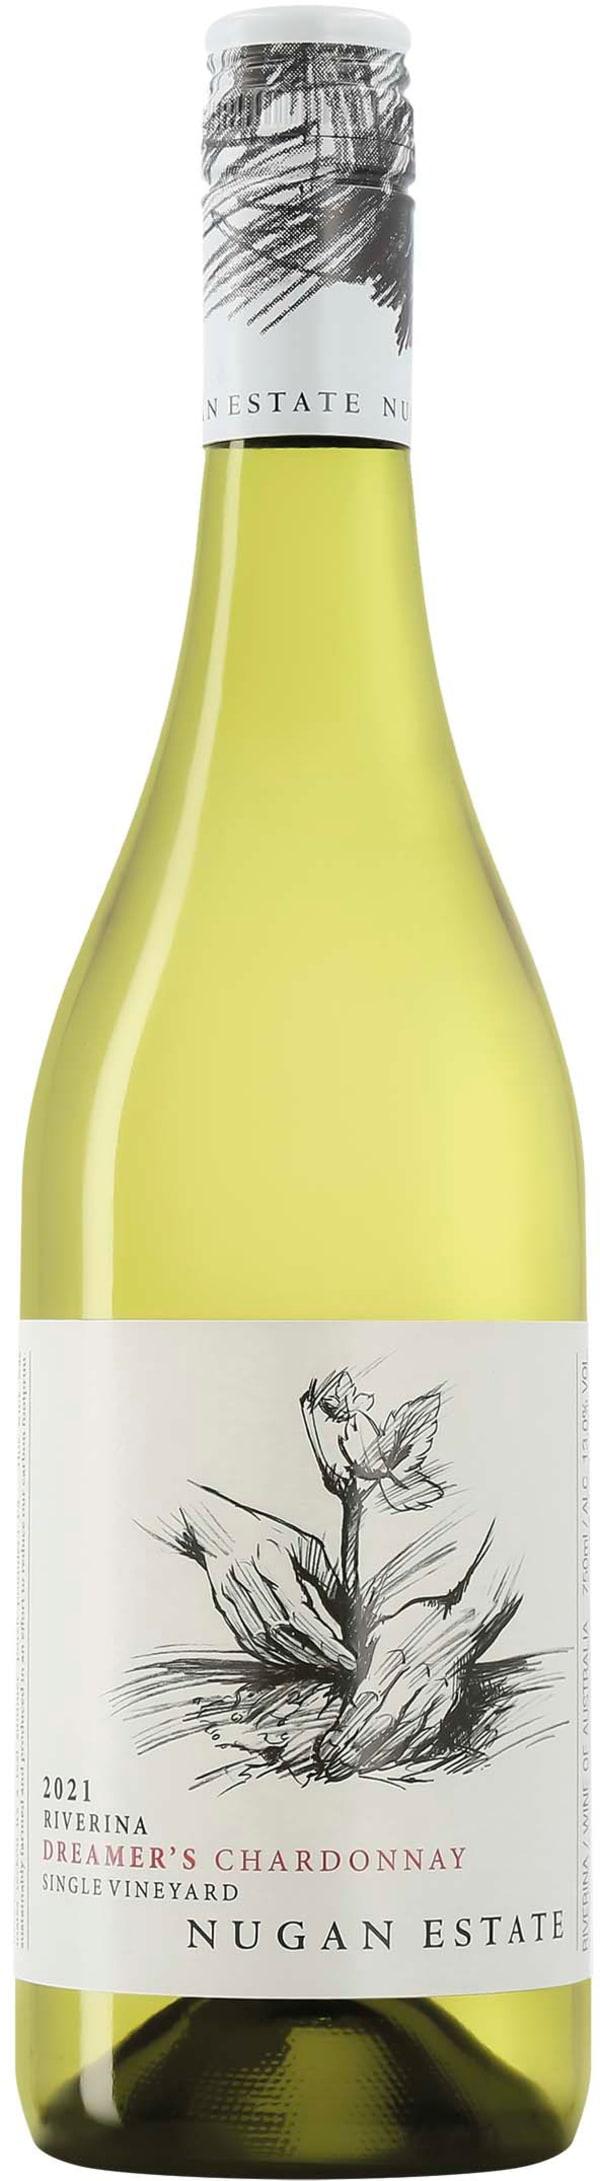 Nugan Dreamer´s Chardonnay 2017